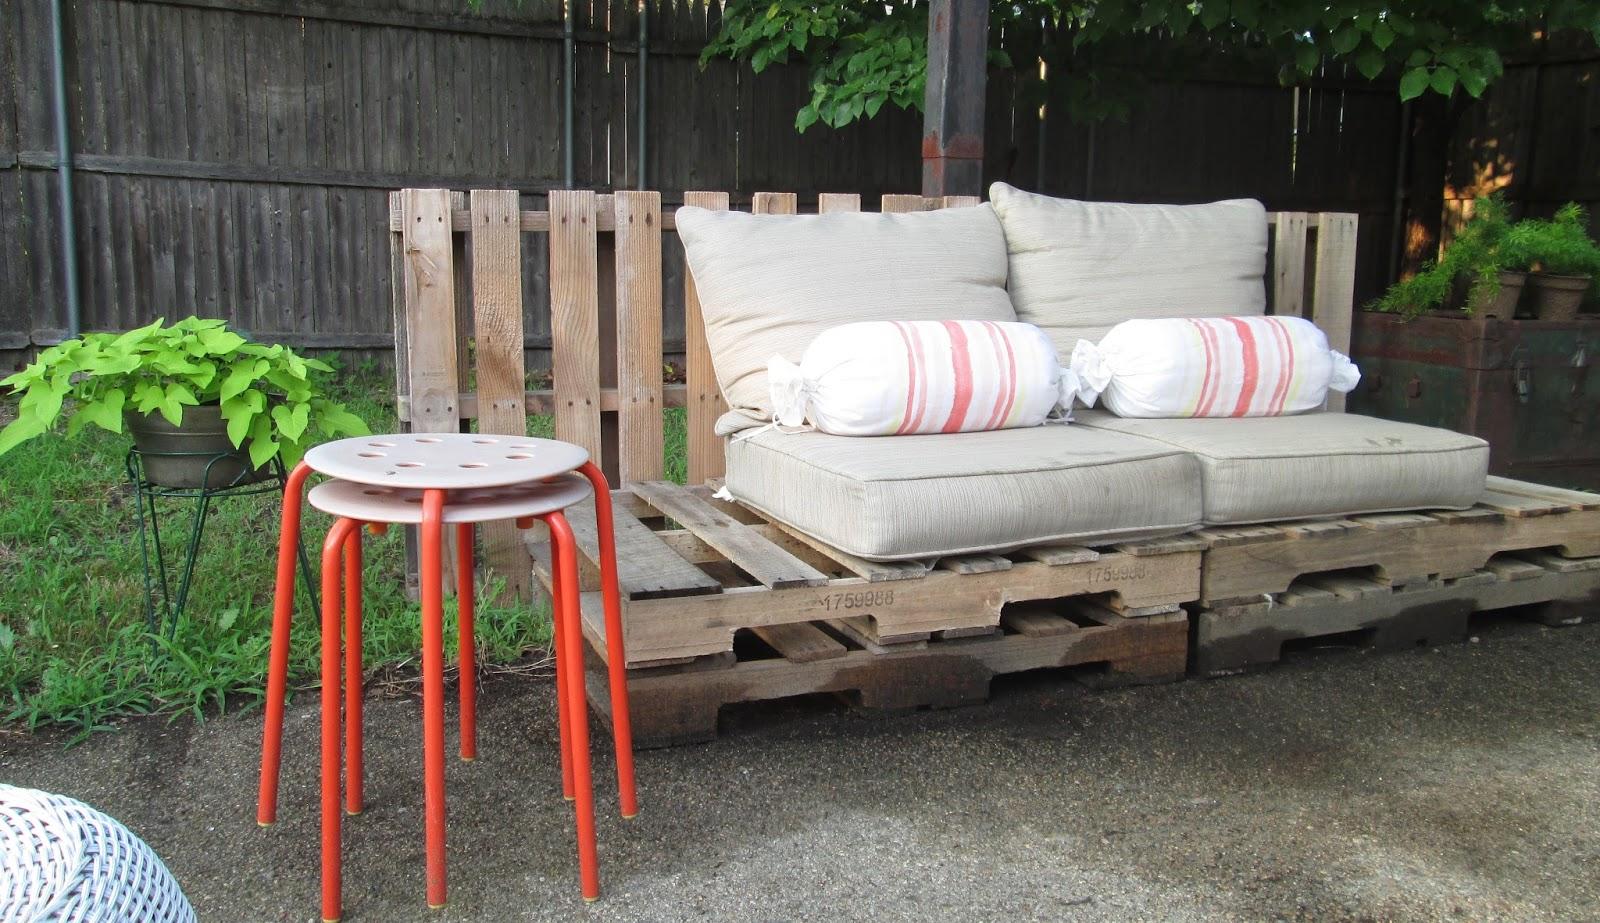 Amber Wilhelmina: Outdoor Spaces: DIY Pallet Lounge Seating